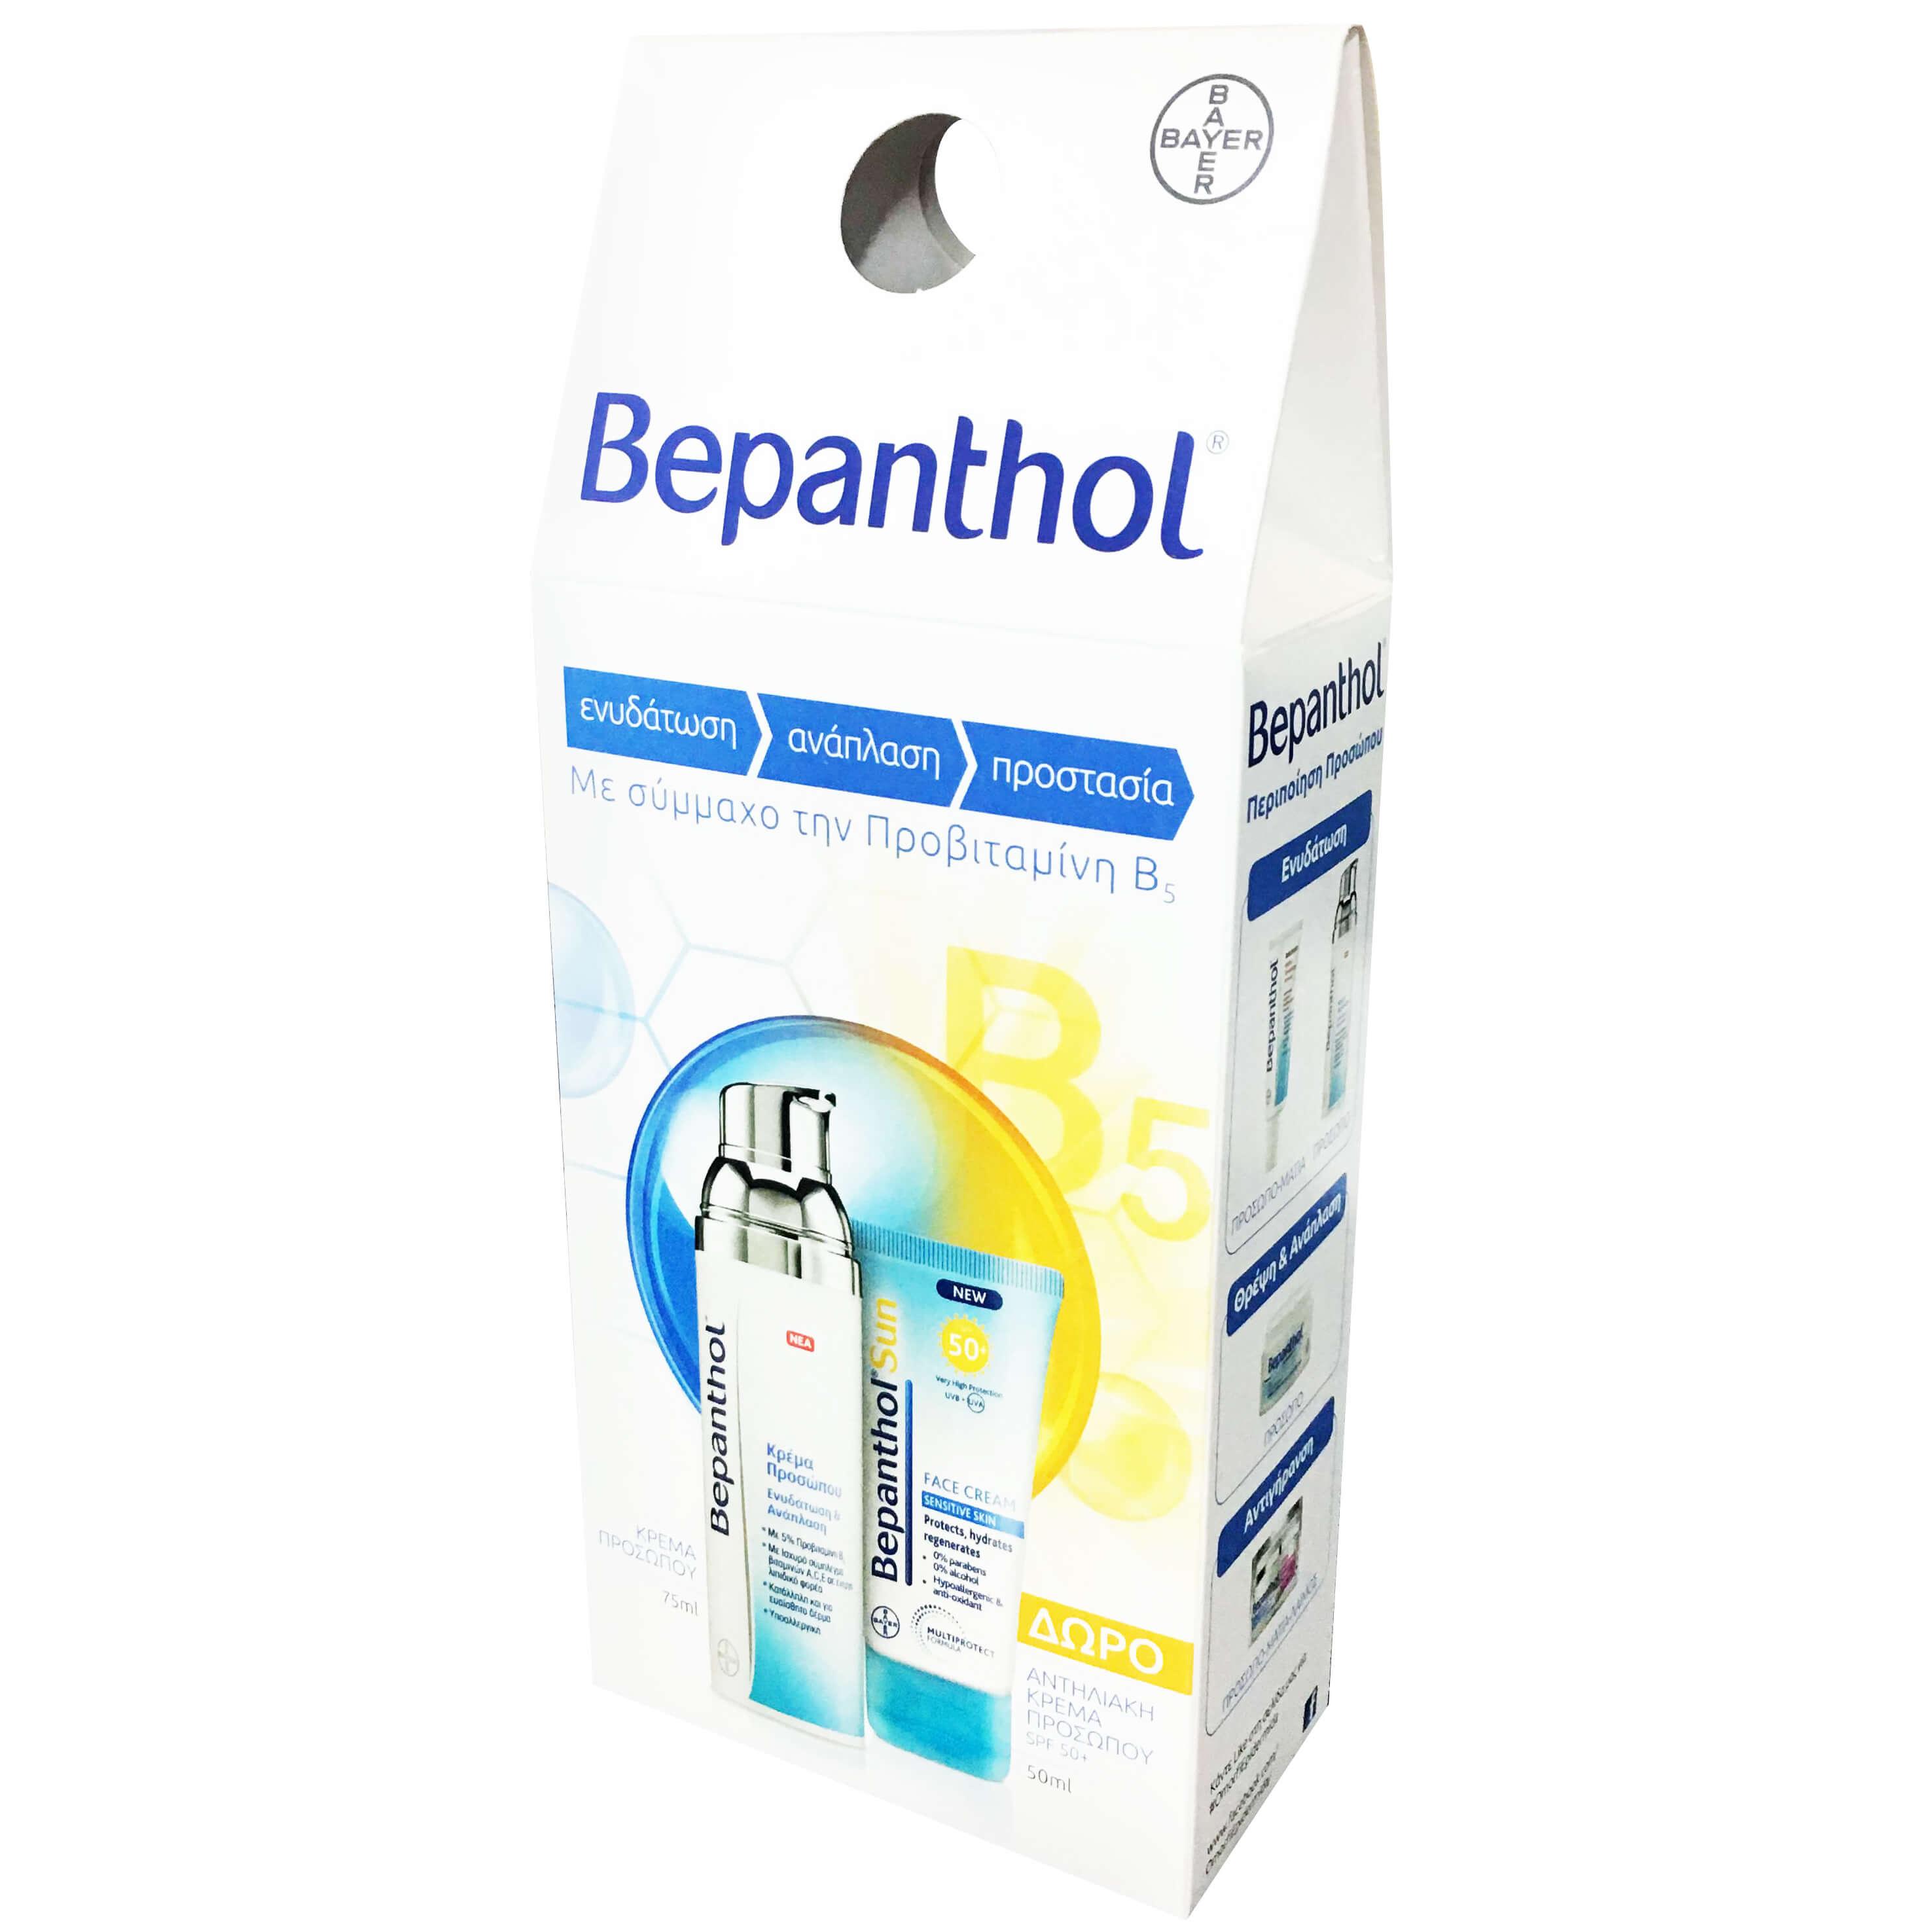 Bepanthol Πακέτο Προσφοράς Κρέμα Προσώπου για Ενυδάτωση & Ανάπλαση, 75ml & Δώρο  σετ   σετ περιποίησης προσώπου   σετ ενυδάτωσης και λάμψης